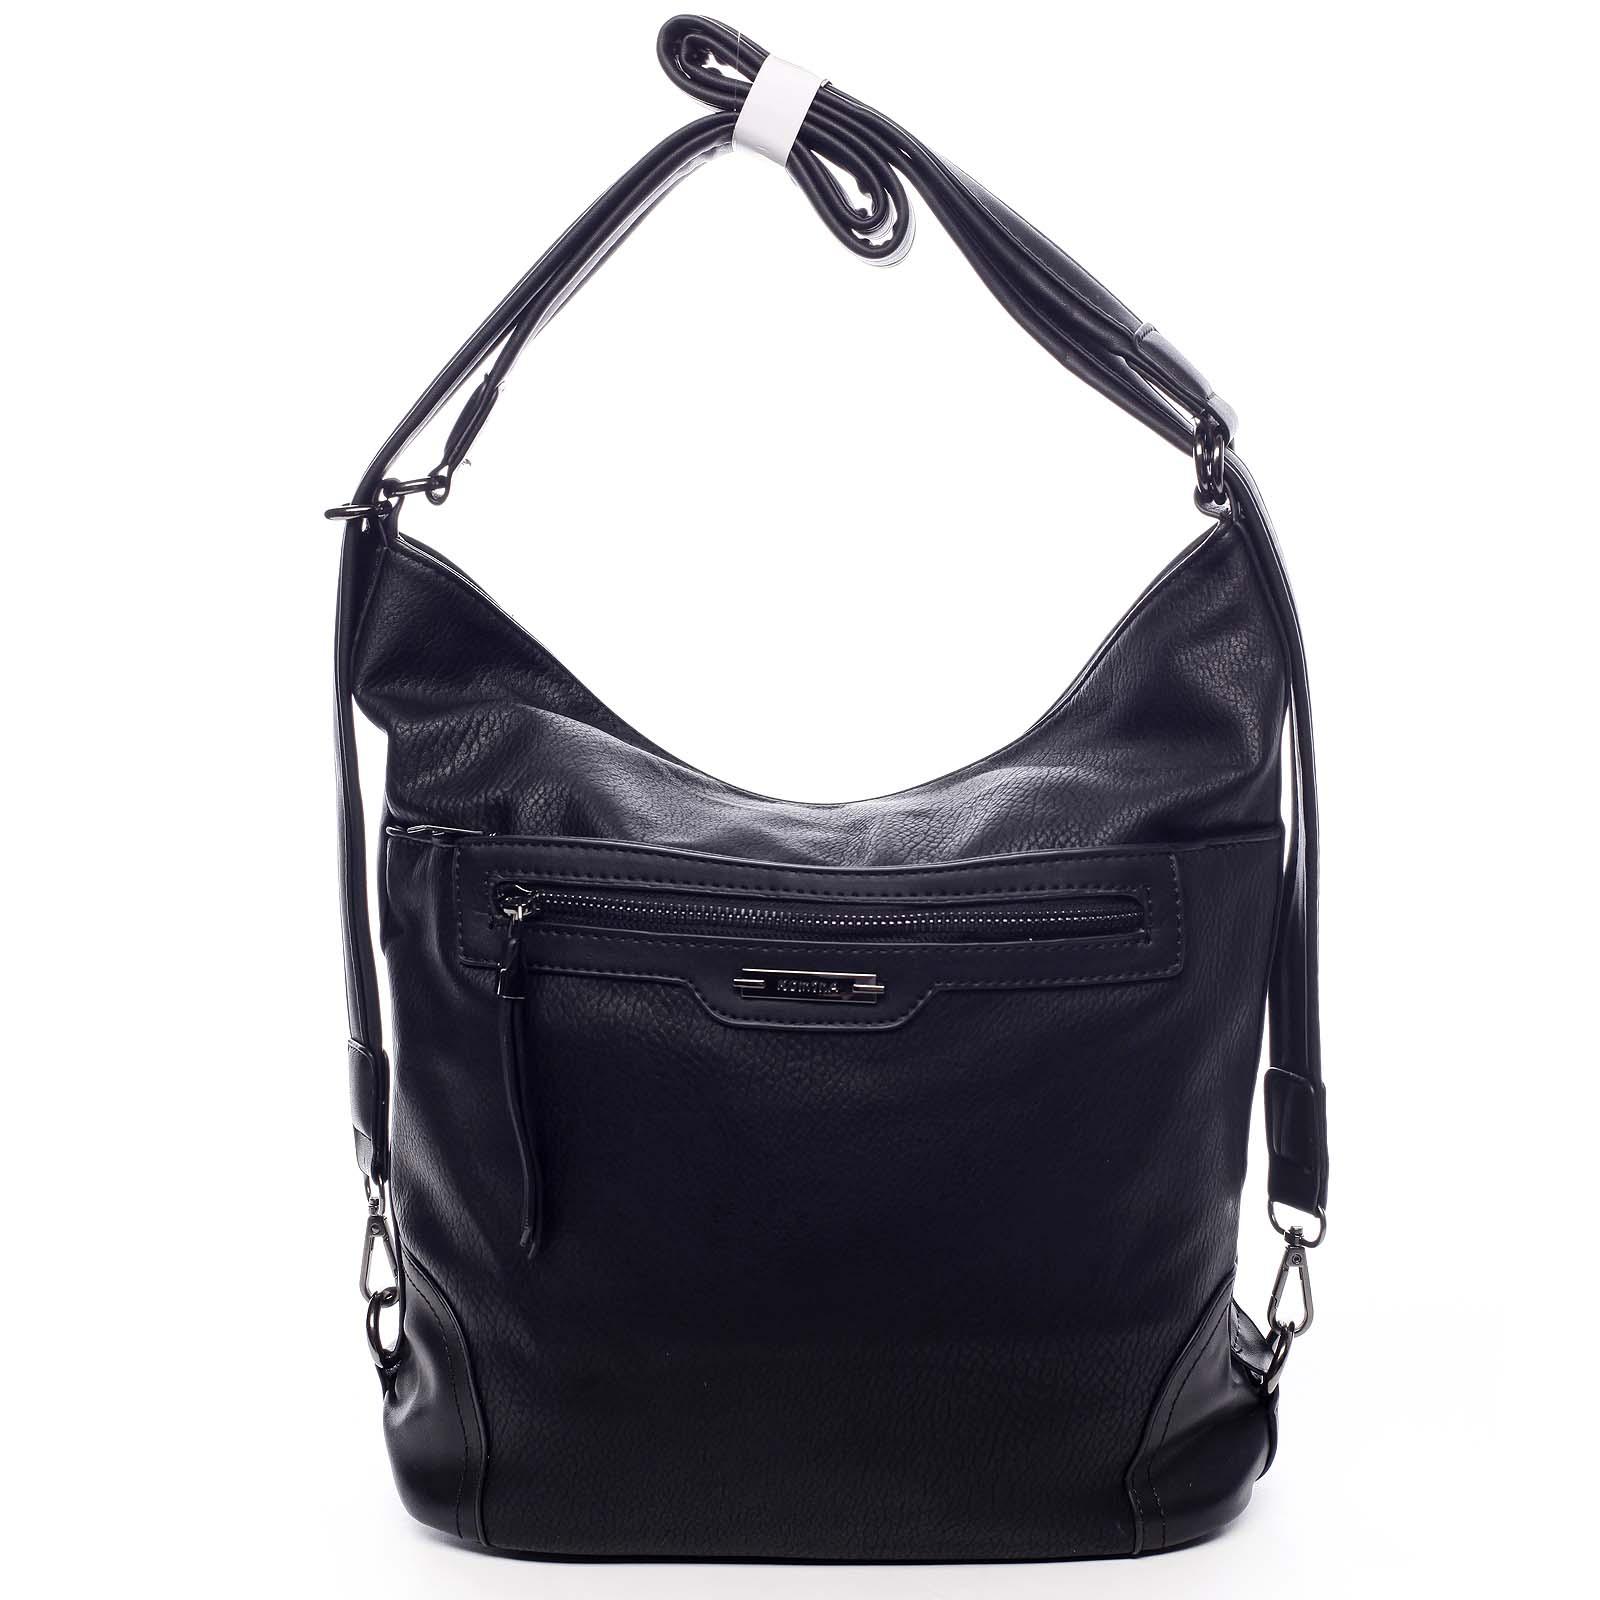 Dámska kabelka batoh čierna - Romina Zilla čierna